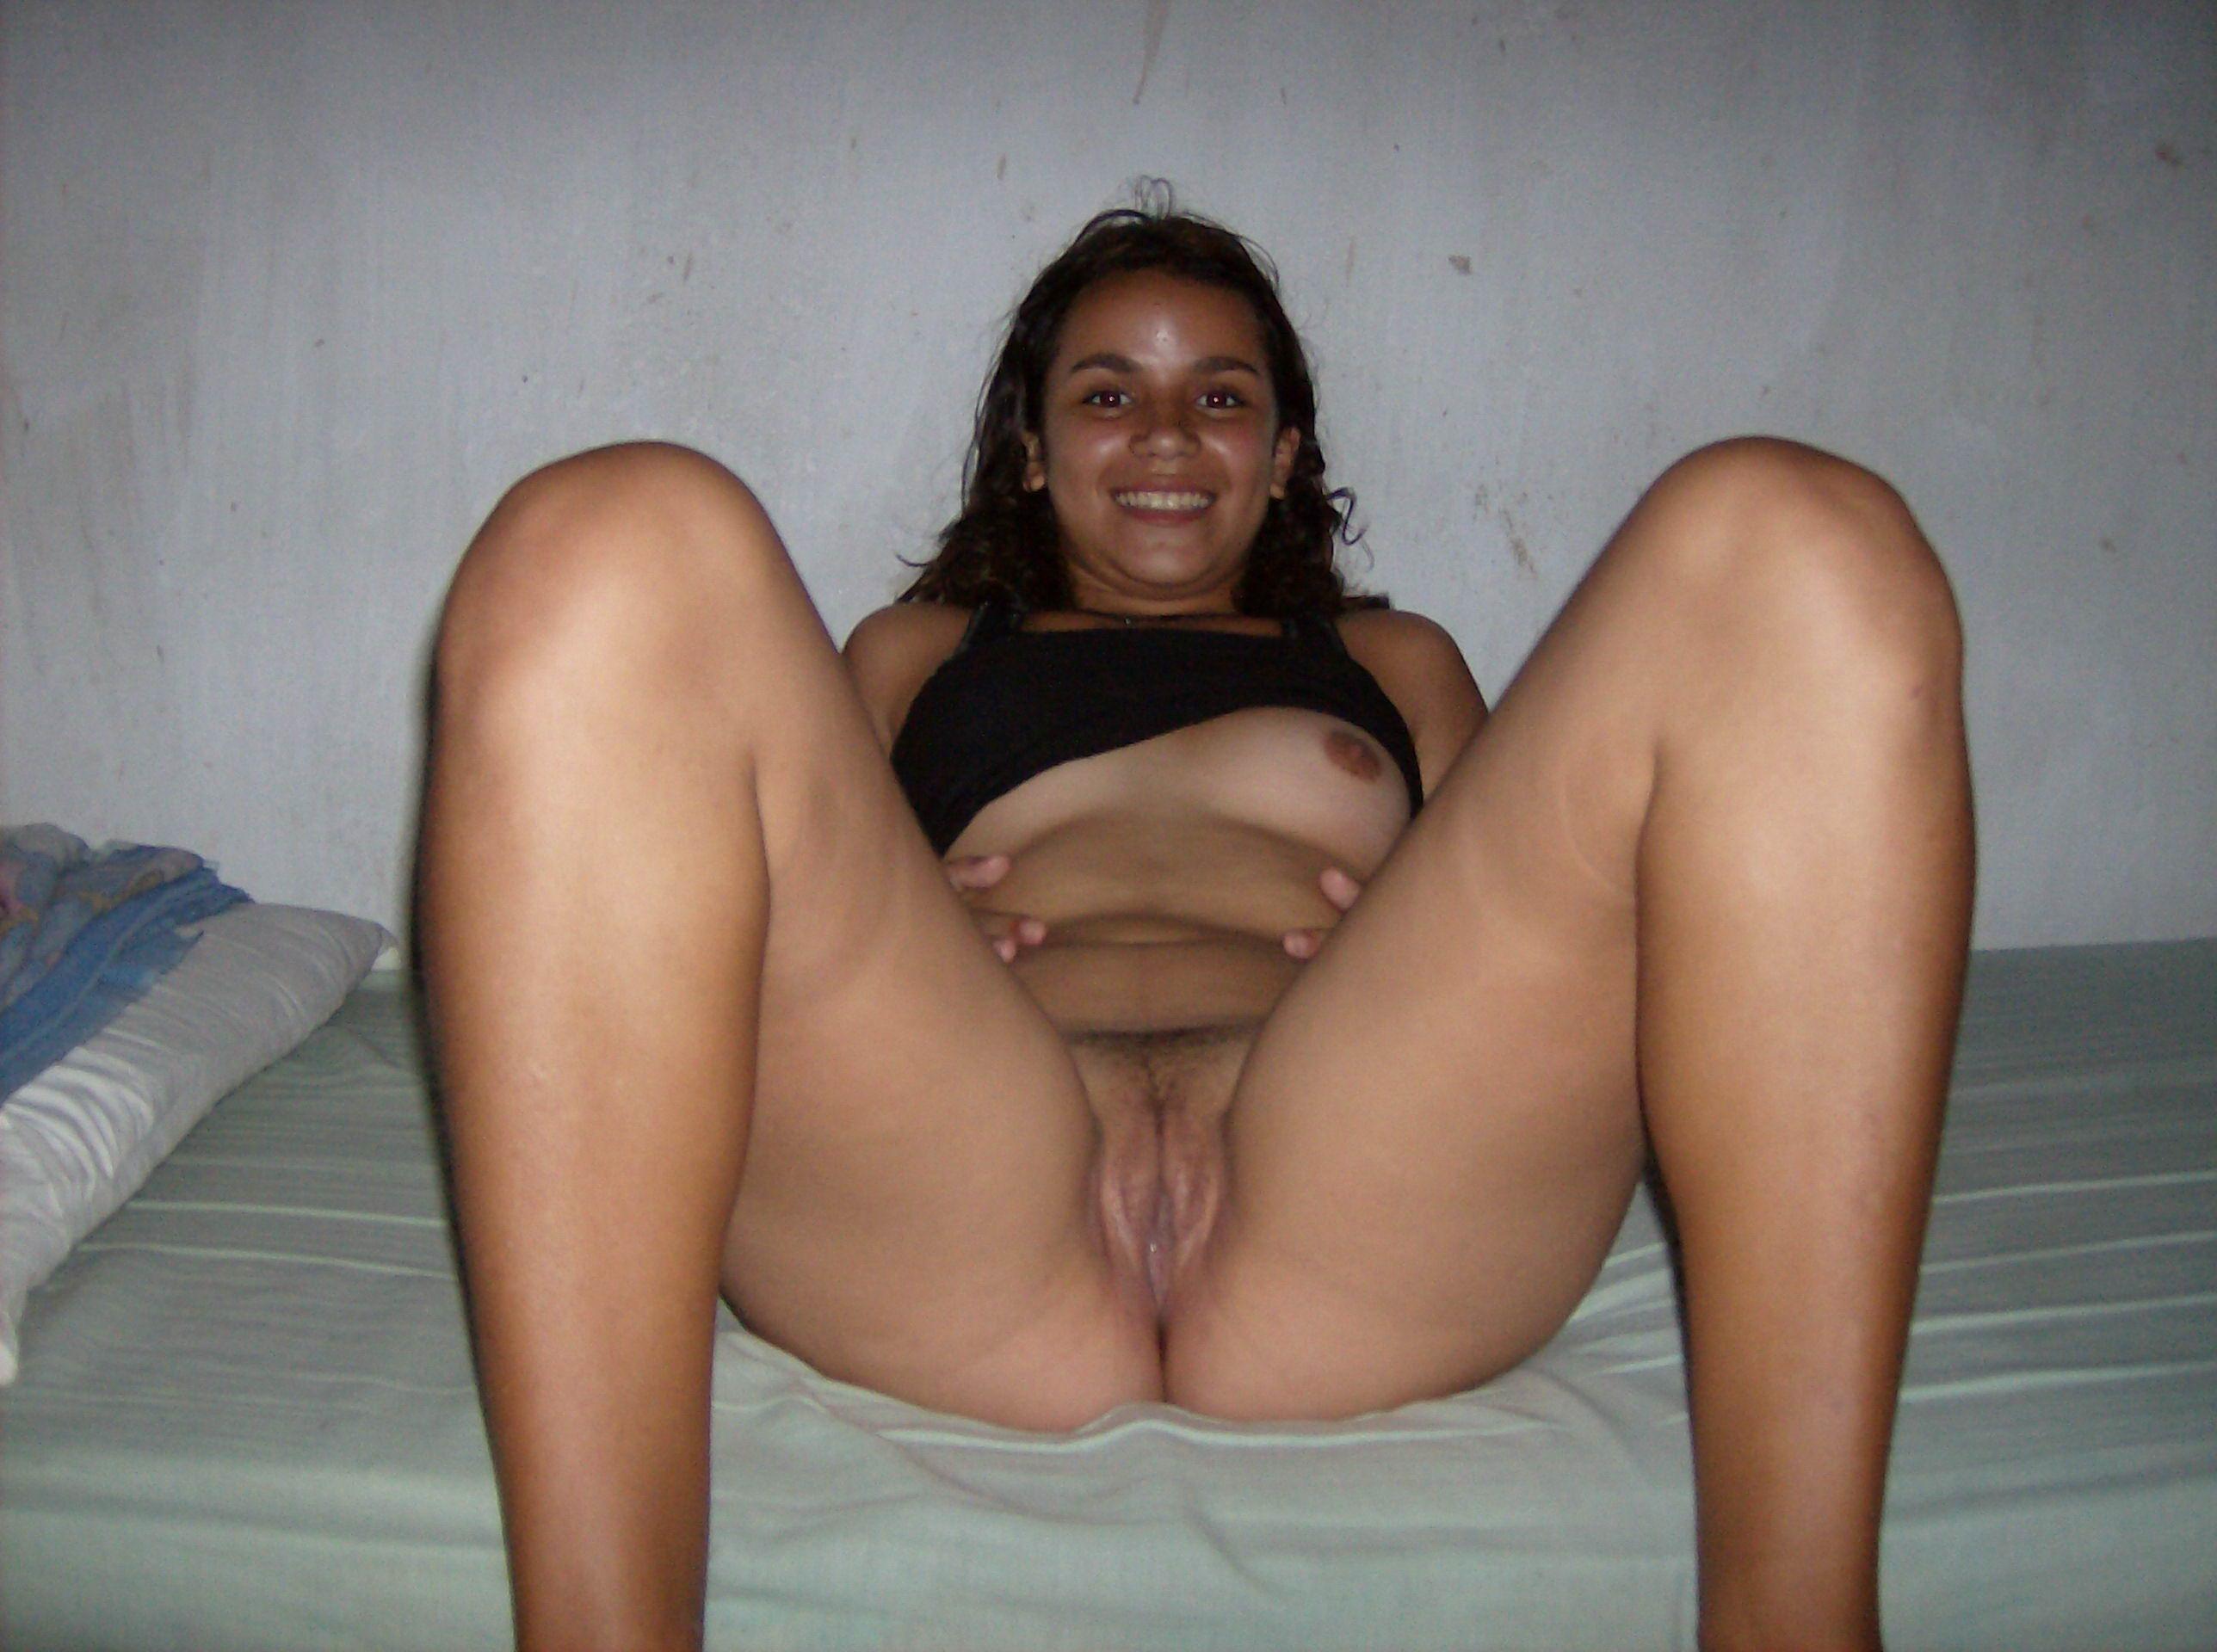 Punjabi petite girl with amazing fuck and bj